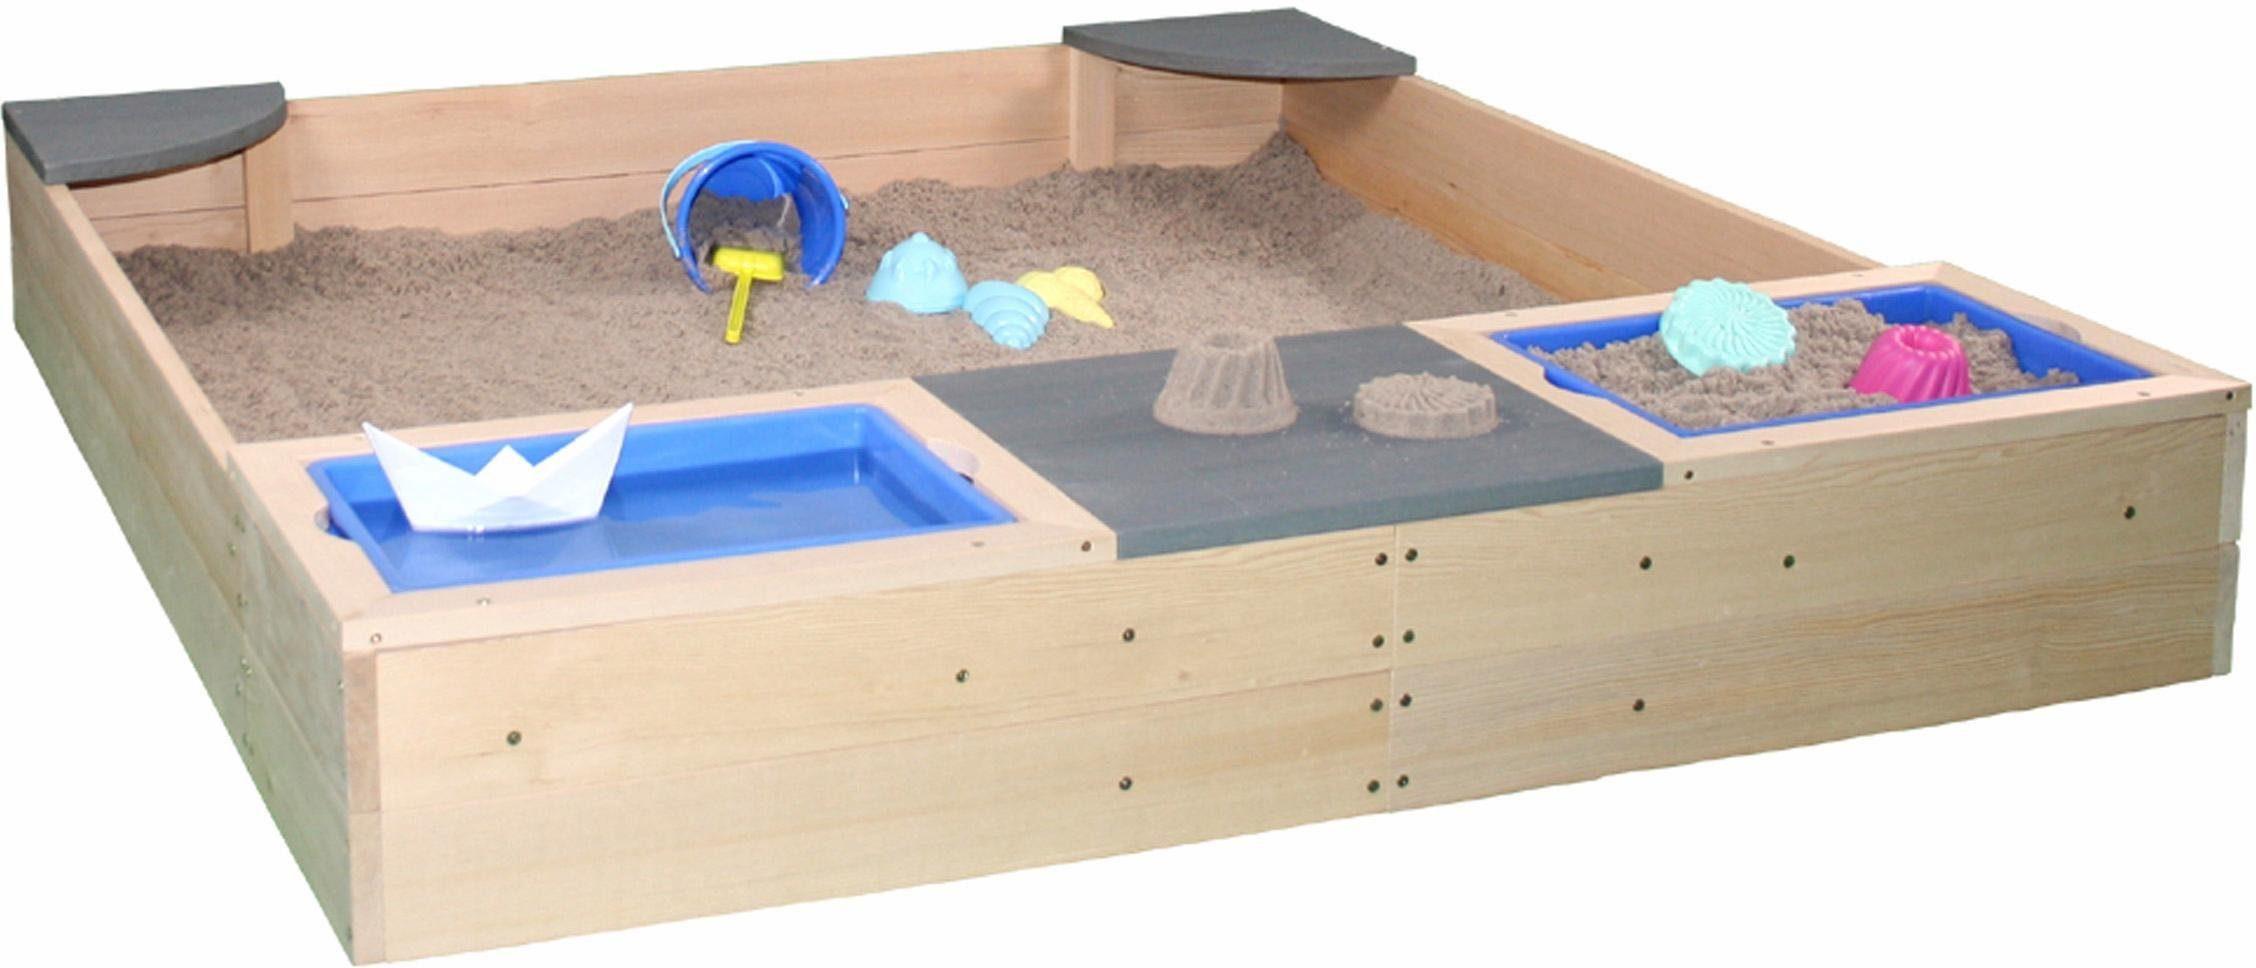 Sun Sandkasten aus Holz, »Strand & Meer«